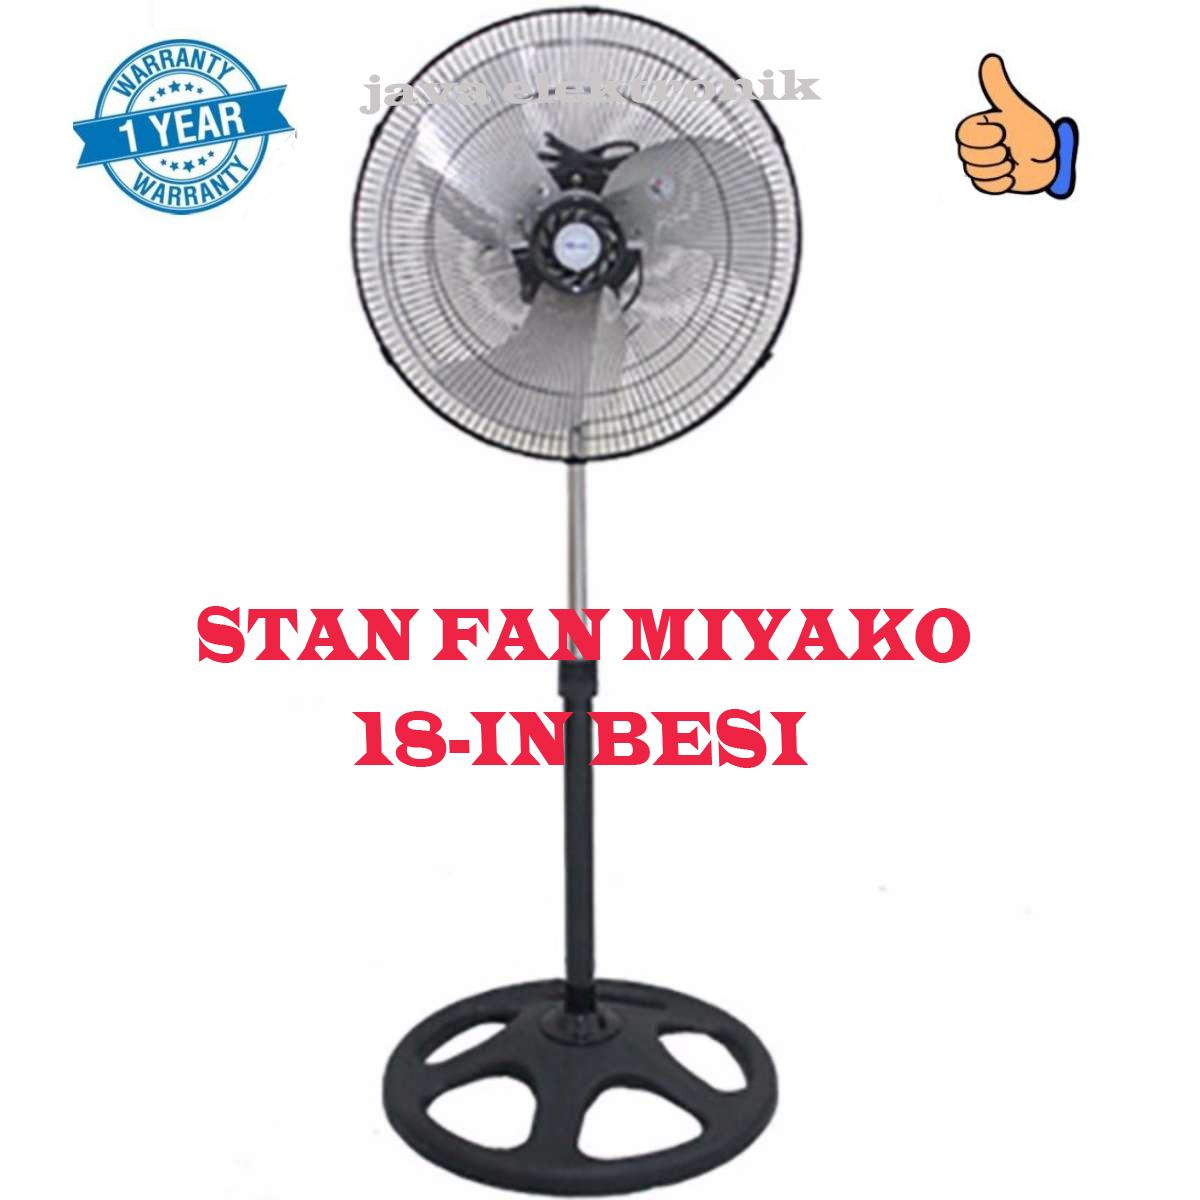 Jual Kipas Angin Miyako Terbaru Desk Fan Ampamp Wall Kad 927 B Stand 18in Ksb18 Garansi Resmi